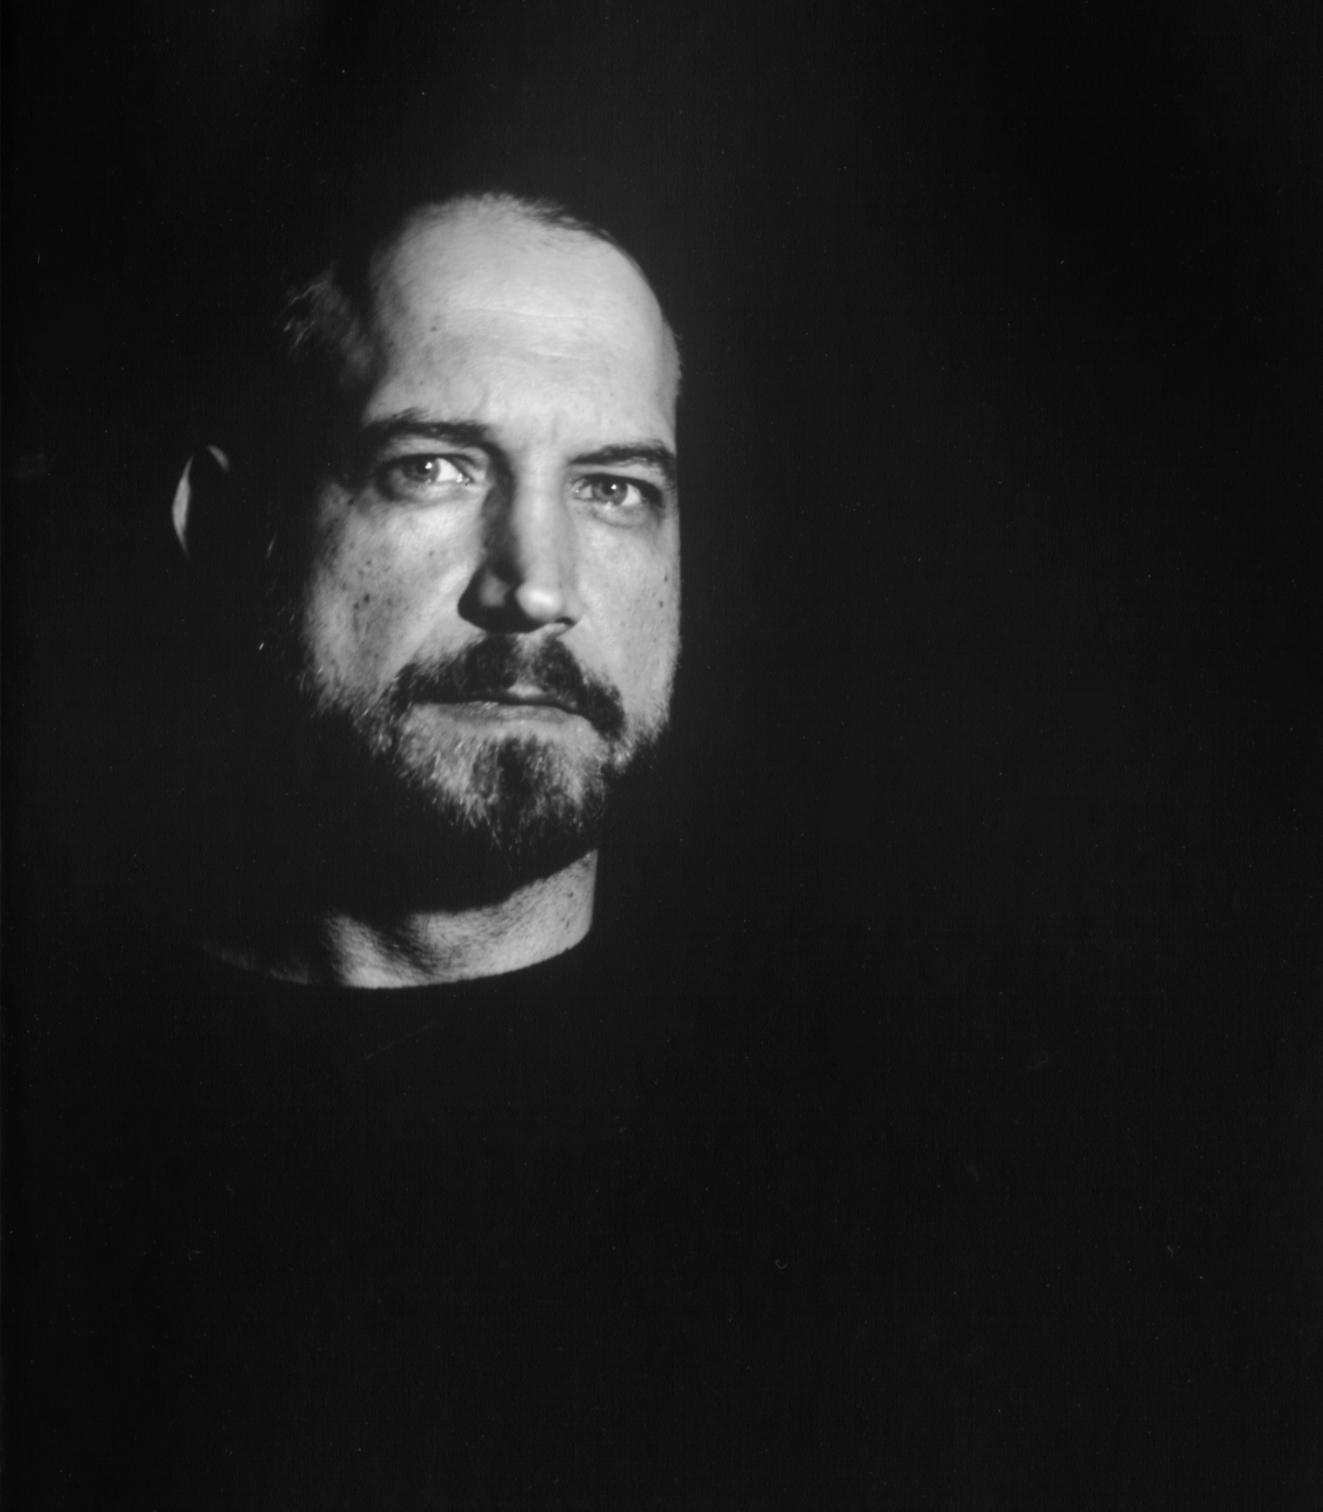 Gintaras Miltenis